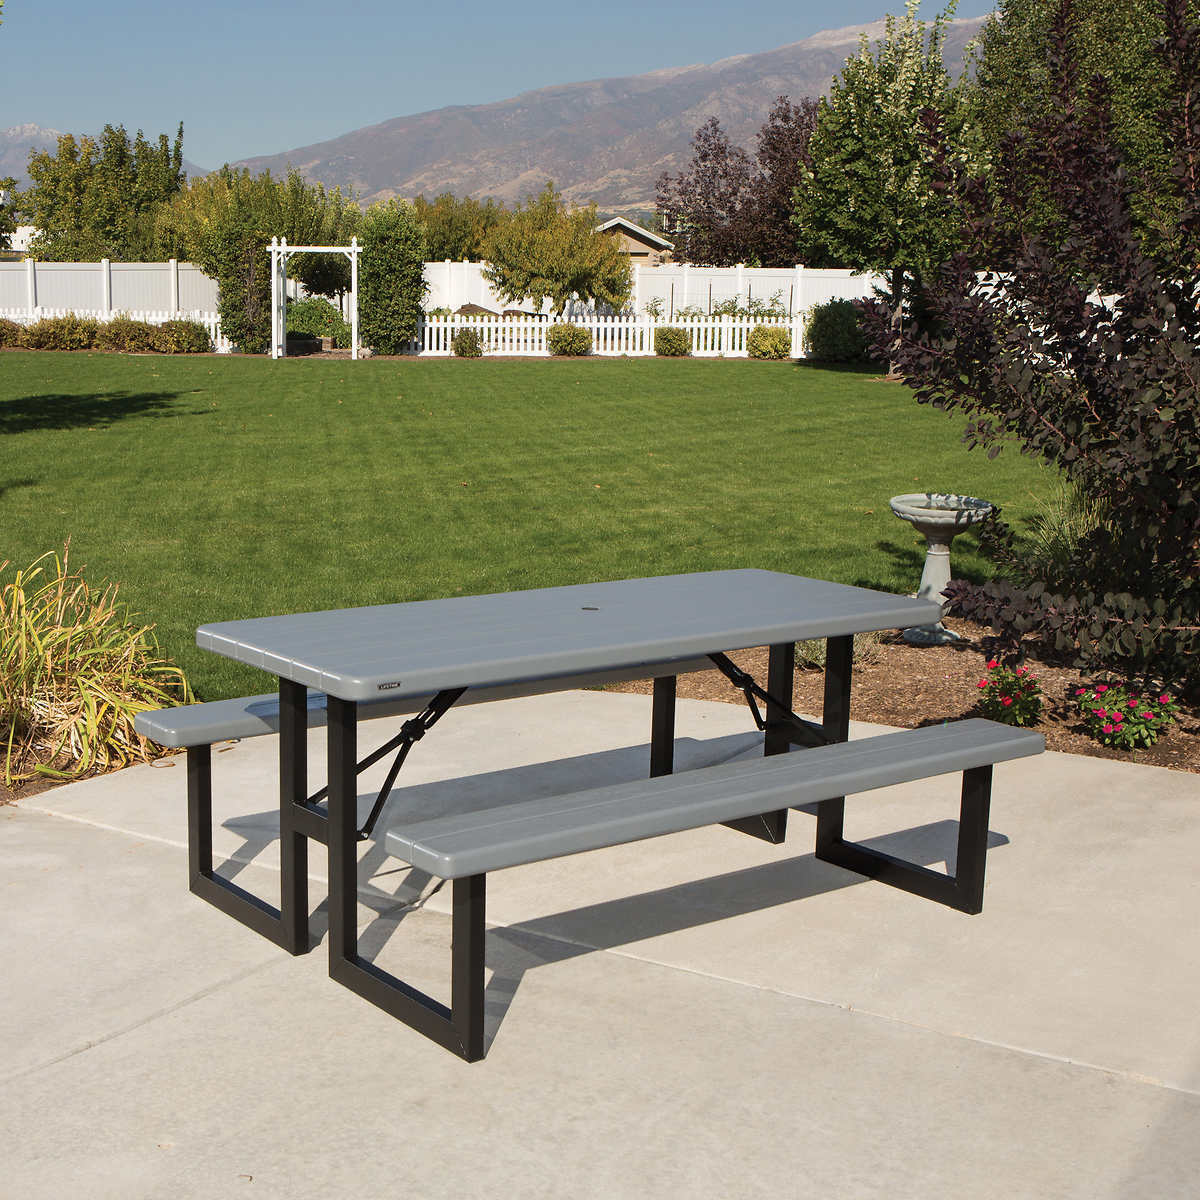 Lifetime 60292 Adirondack Table Gray For Sale Online Ebay